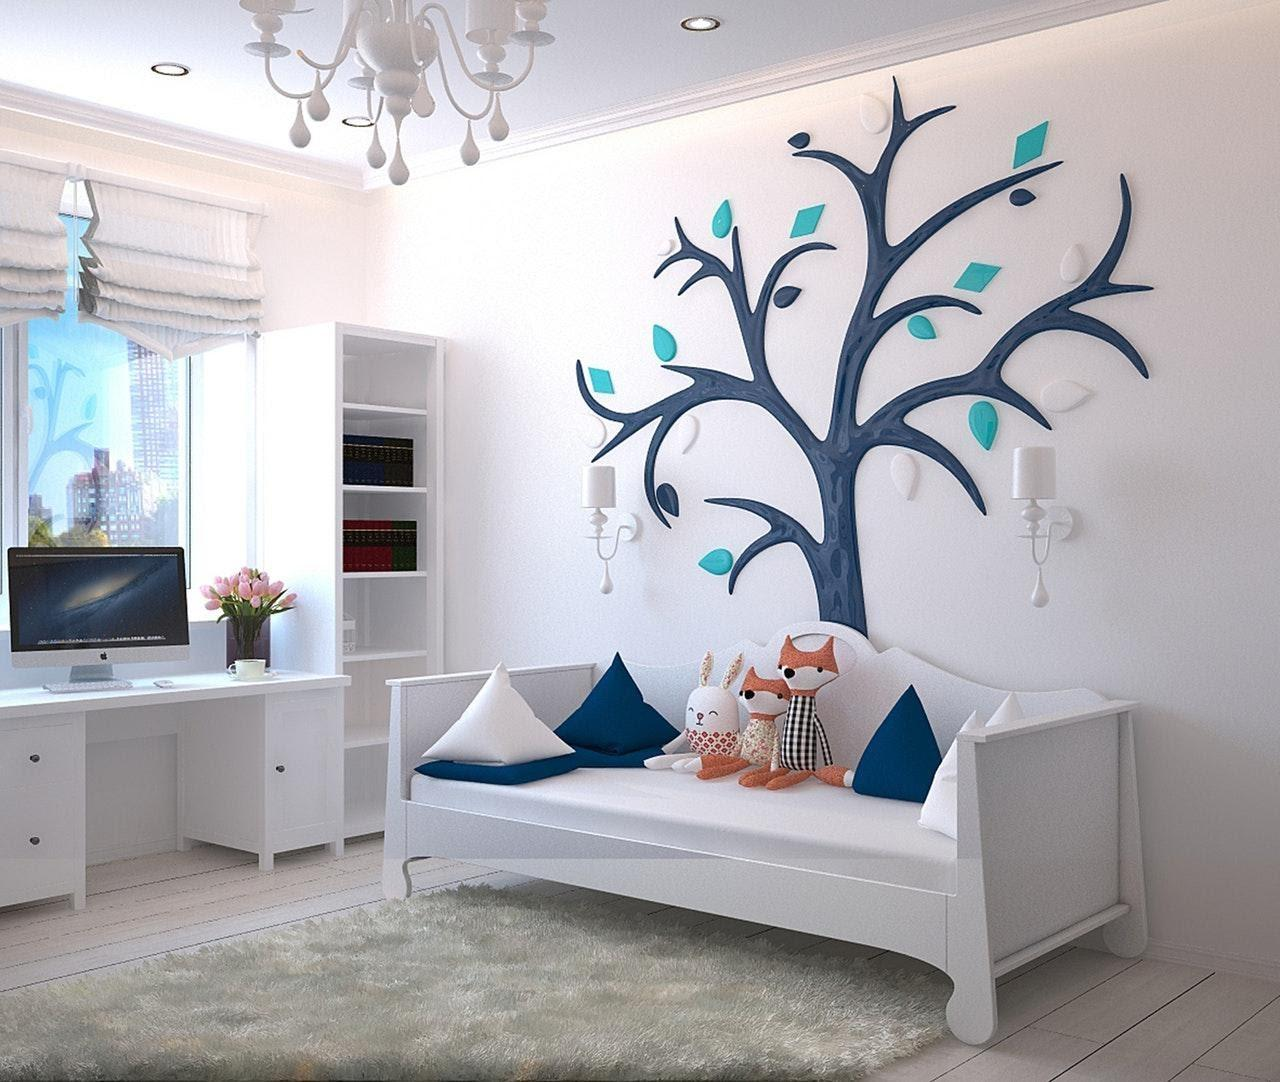 Ragam Cara Menghias Kamar Yang Mudah Cara menghias kamar kecil